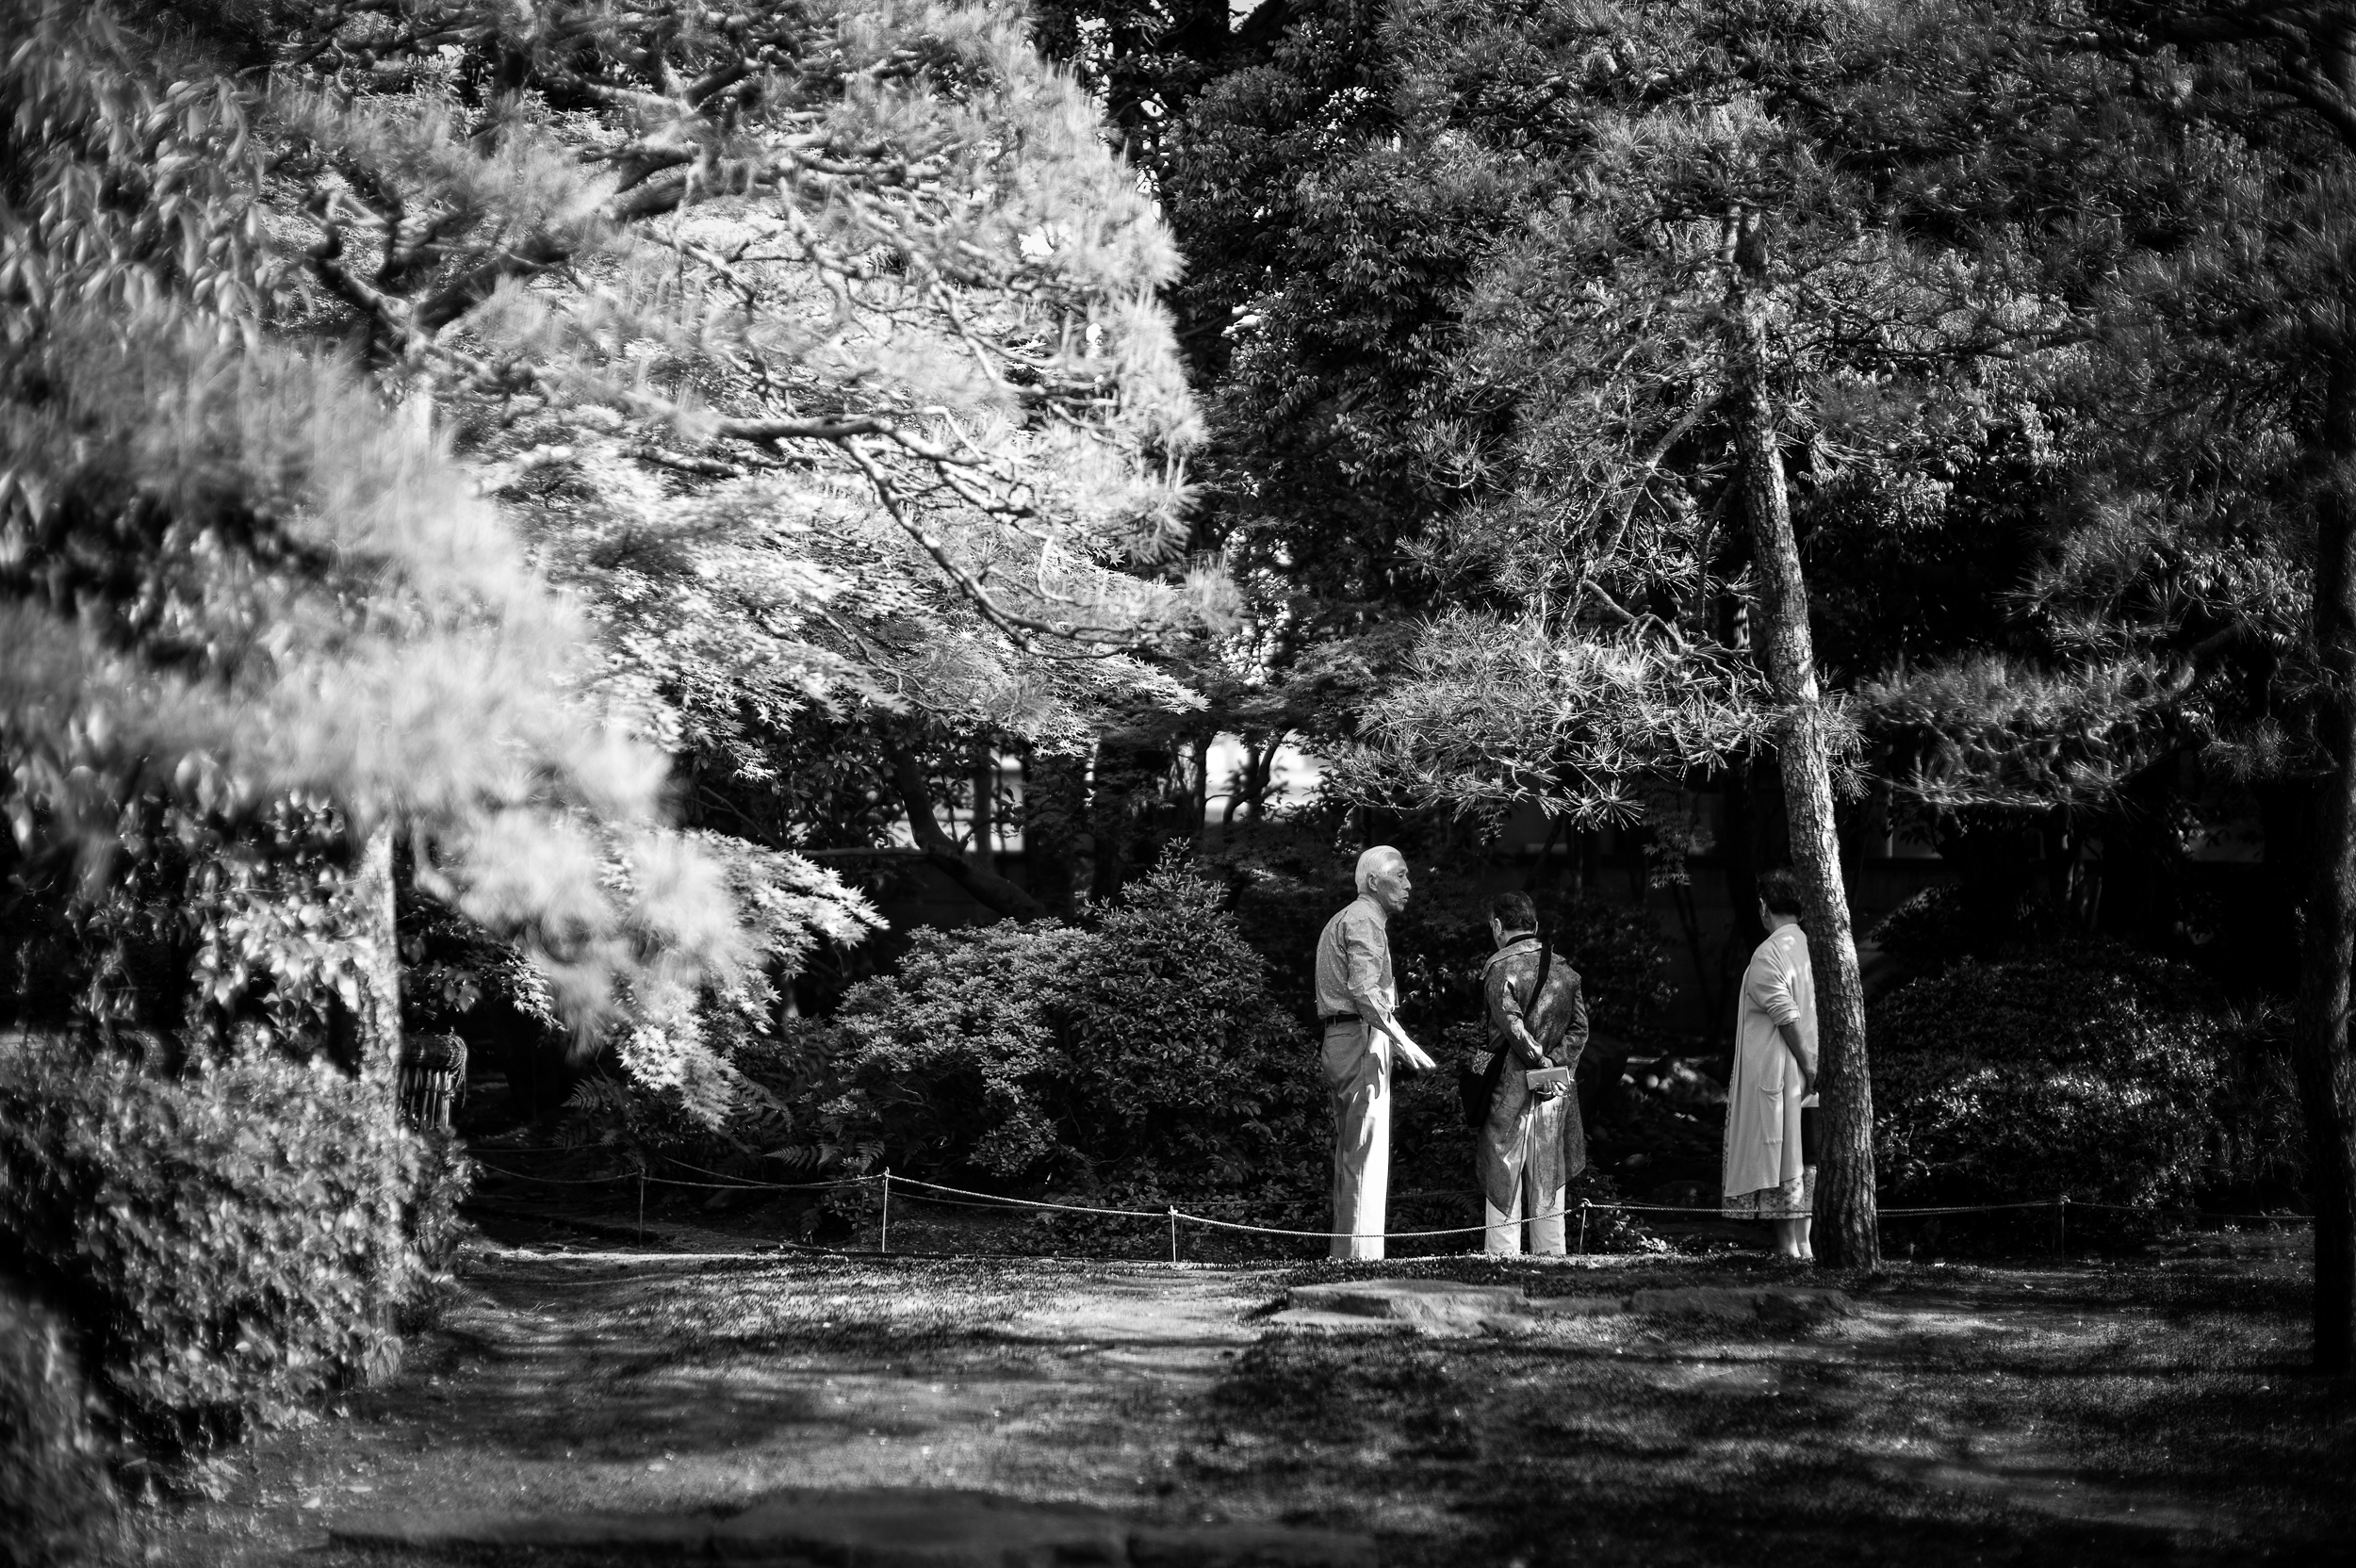 The Japanese garden of Inomata Garden